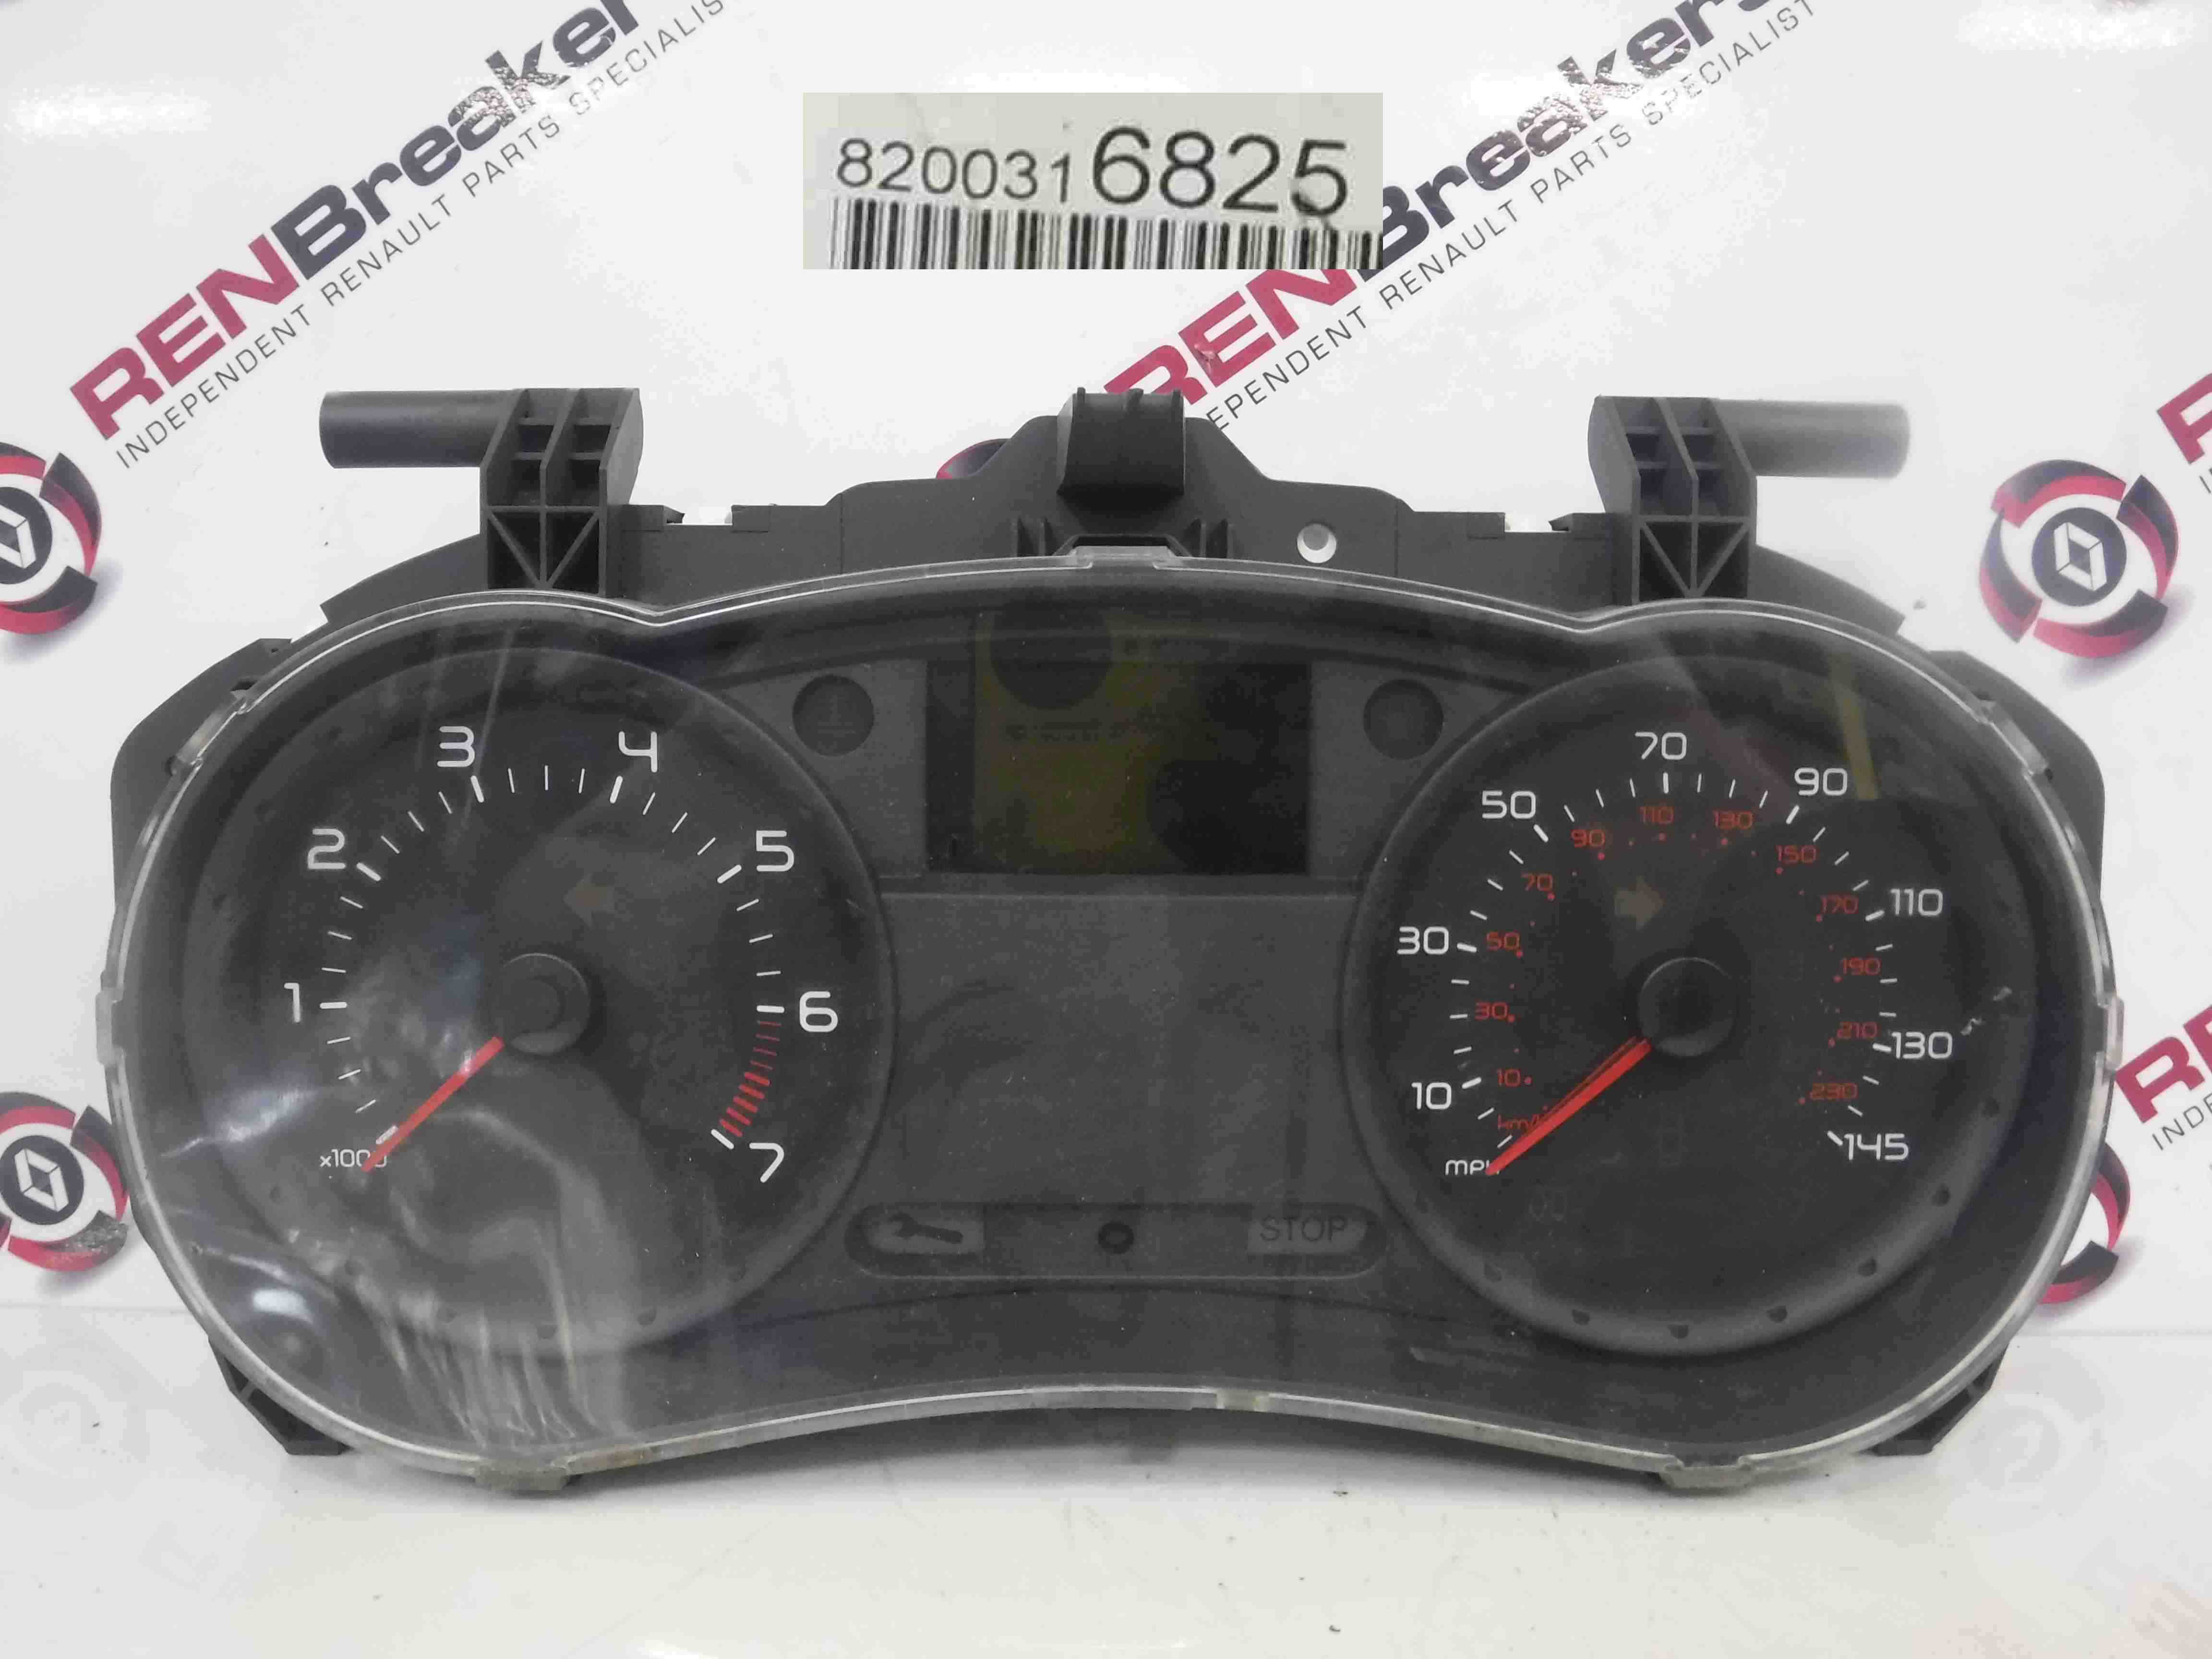 Renault Clio MK3 2005-2012 Instrument Panel Dials Clocks 97K 8200316825